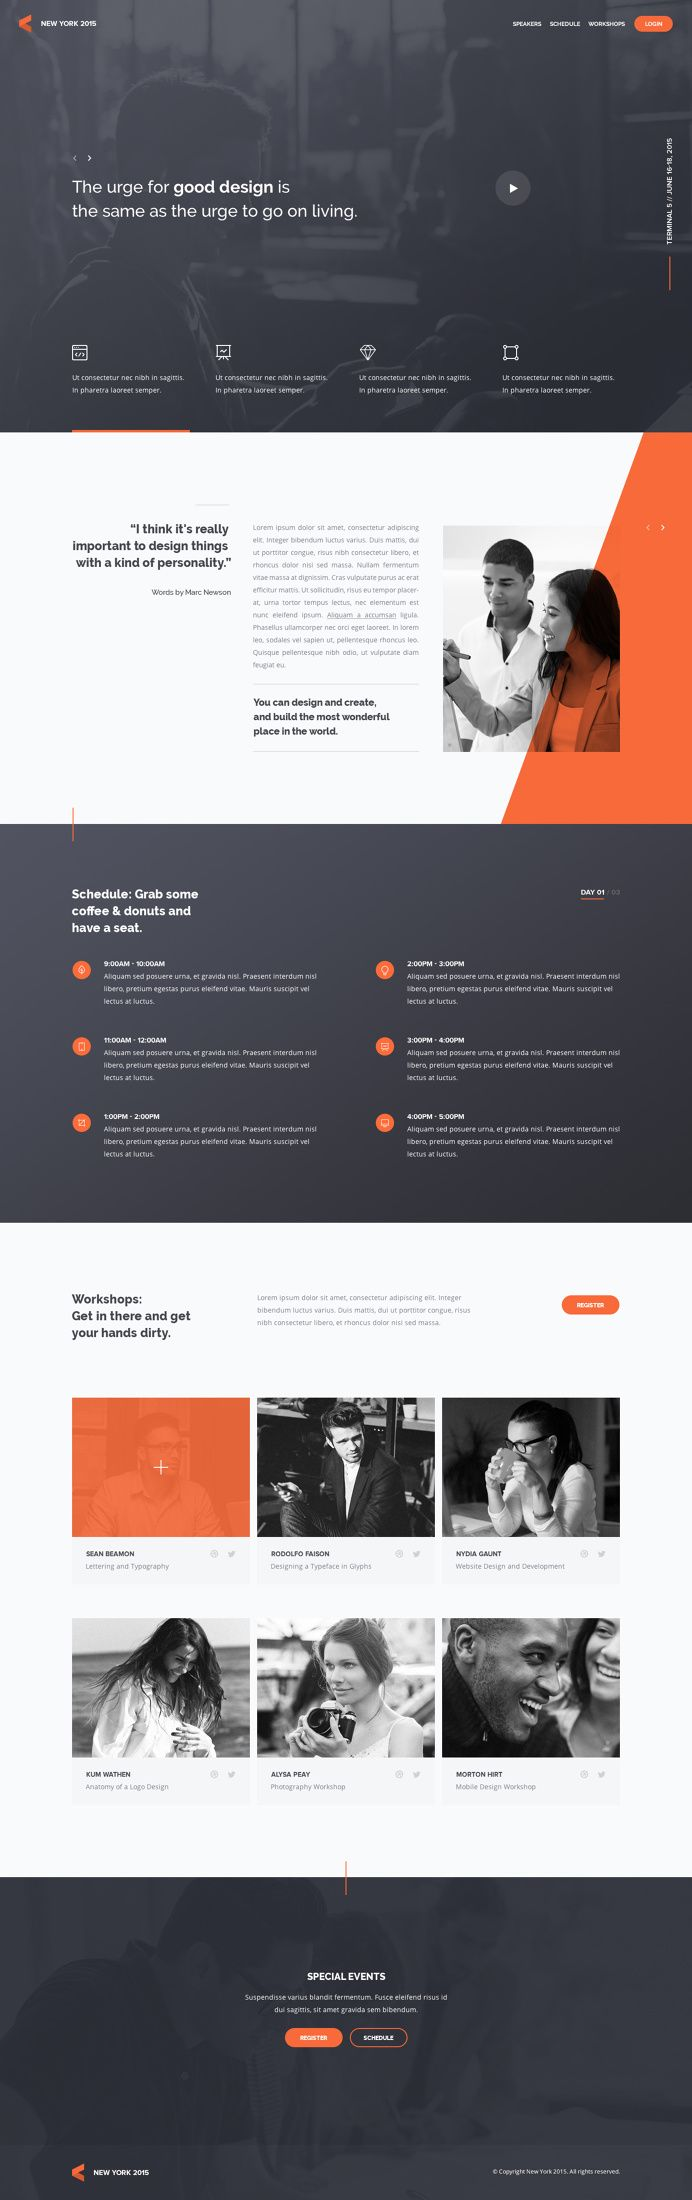 http://designspiration.net/image/395910451146/